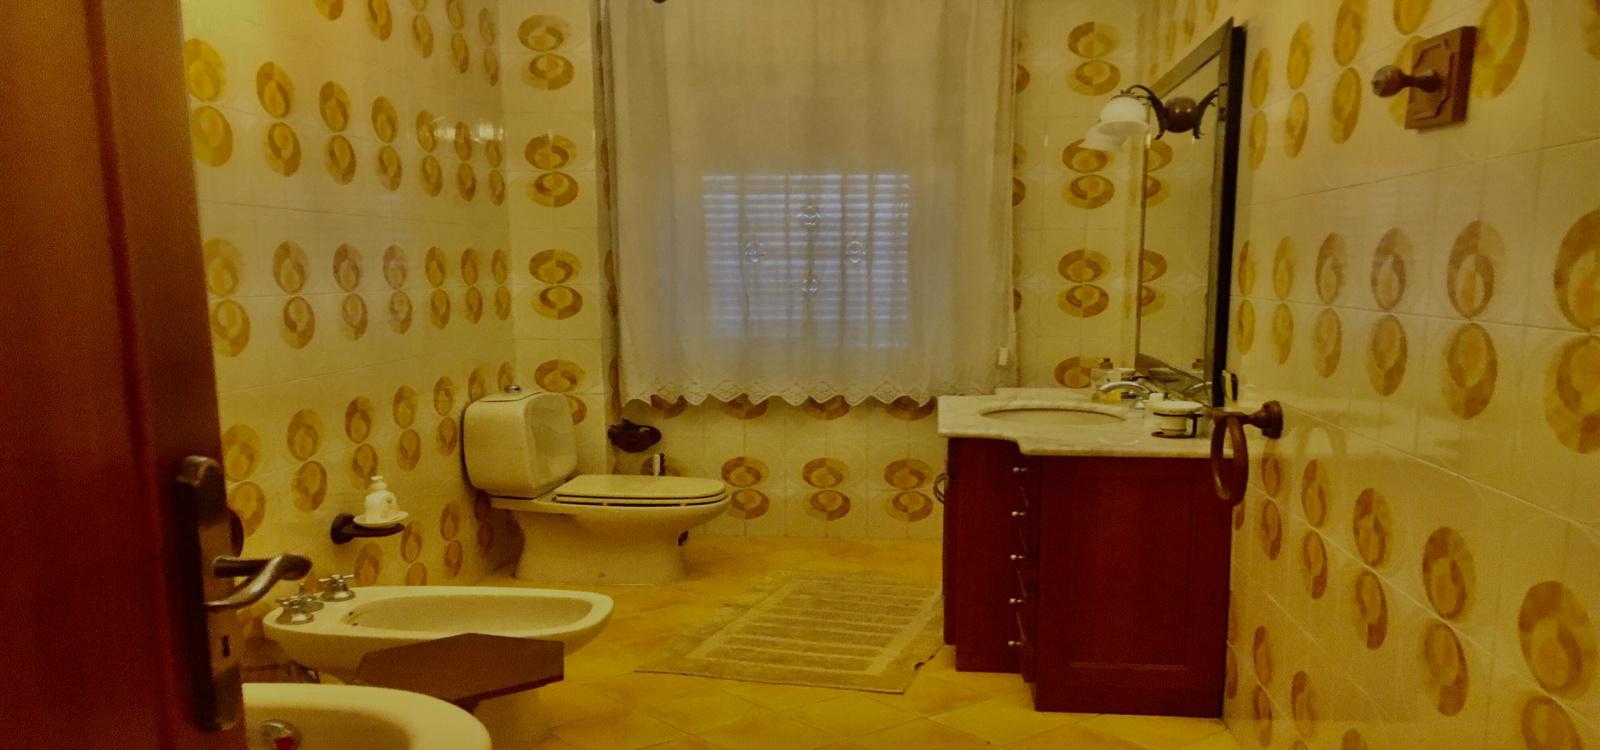 VIALE TERACATI,SIRACUSA,Appartamento,VIALE TERACATI,2433